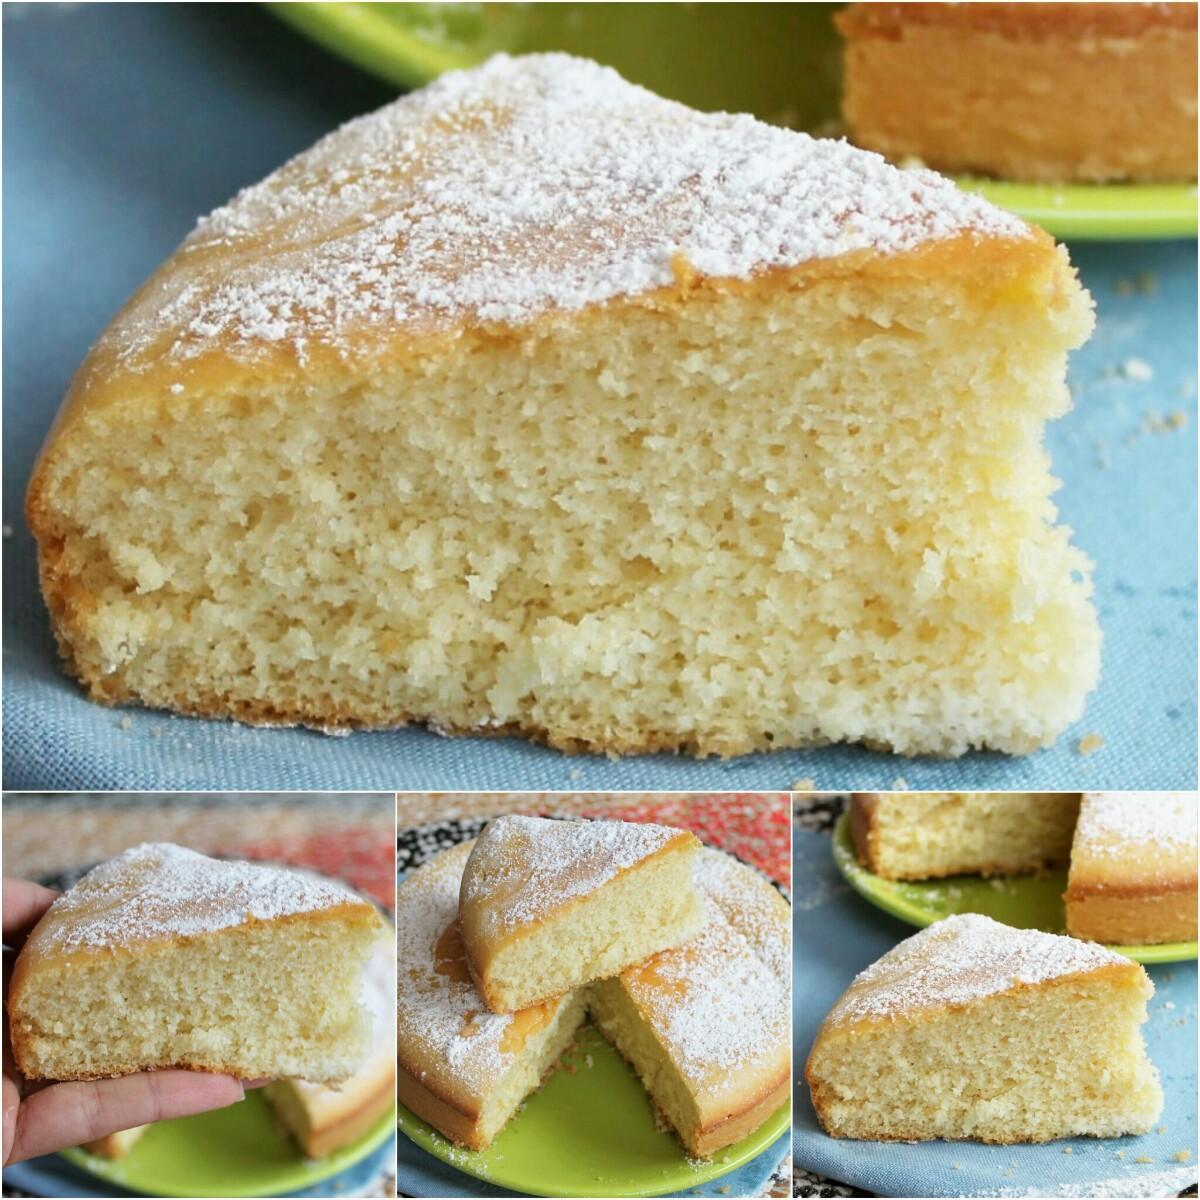 TORTA ALL ACQUA CALDA ricetta torta sofficissima senza burro